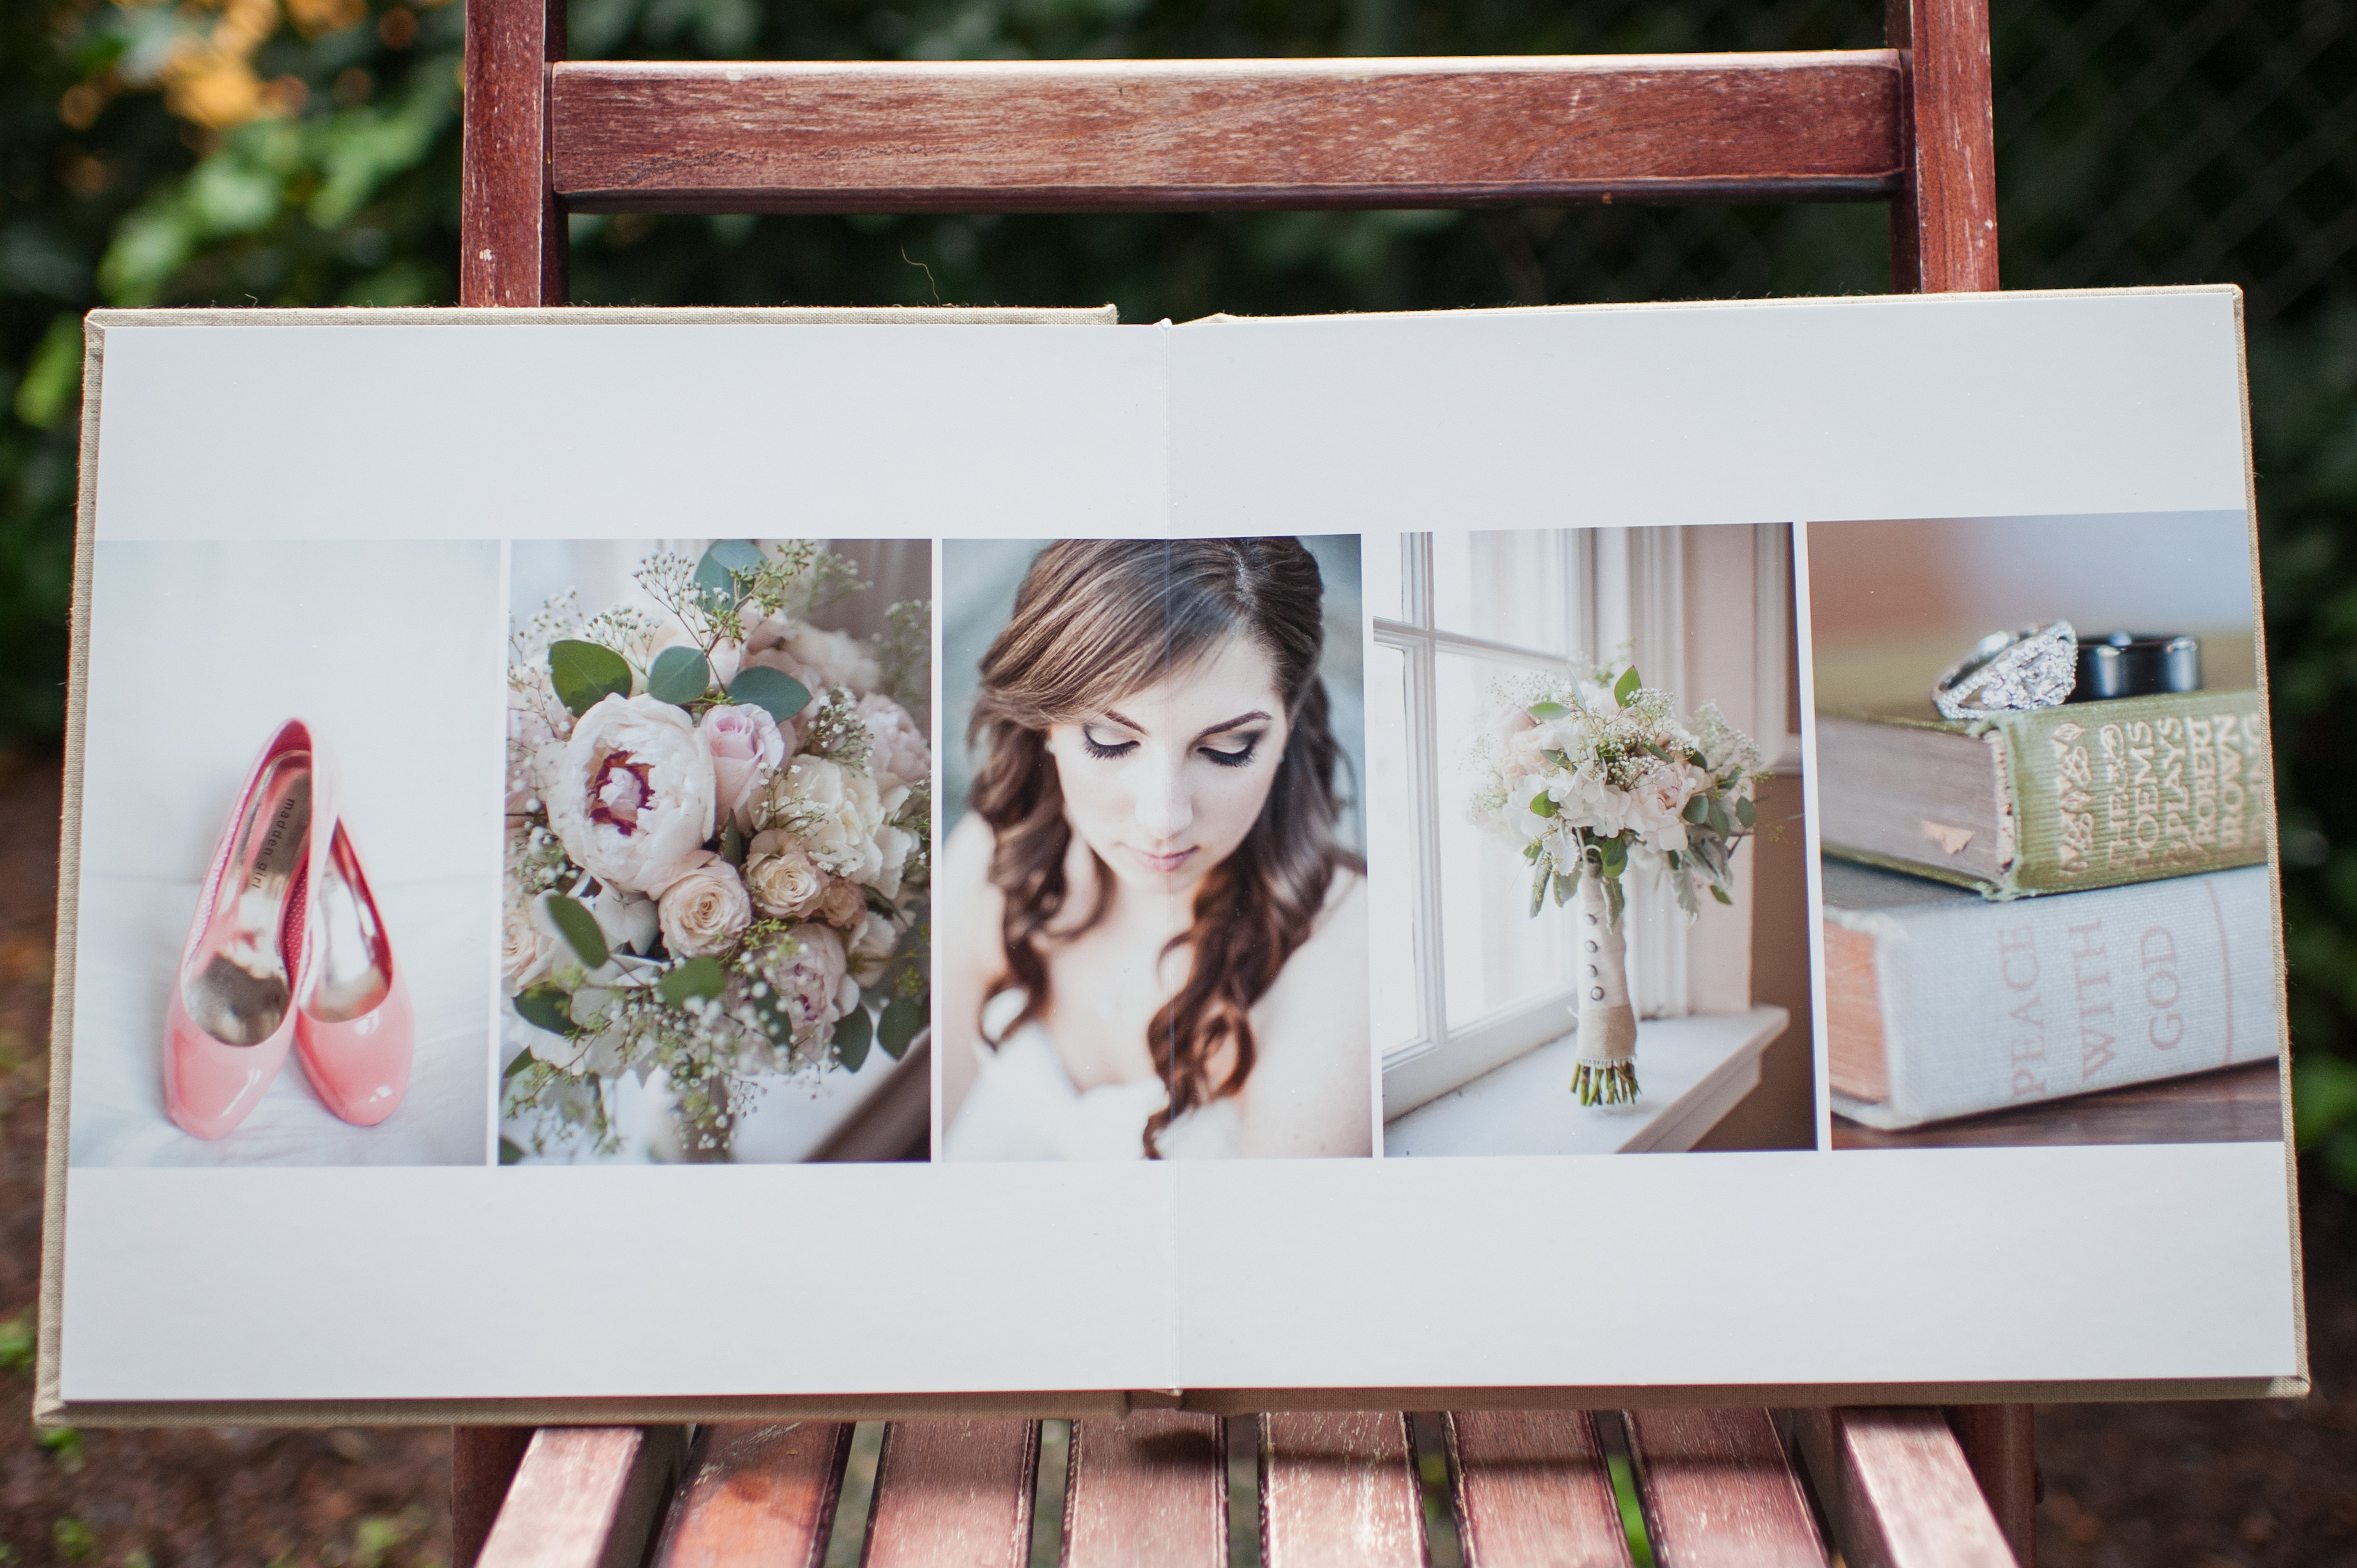 Hilarious Parents Wedding Albums Design Wedding Blue Wedding Photo Albums 4x6 Wedding Photo Album wedding photo Wedding Photo Album